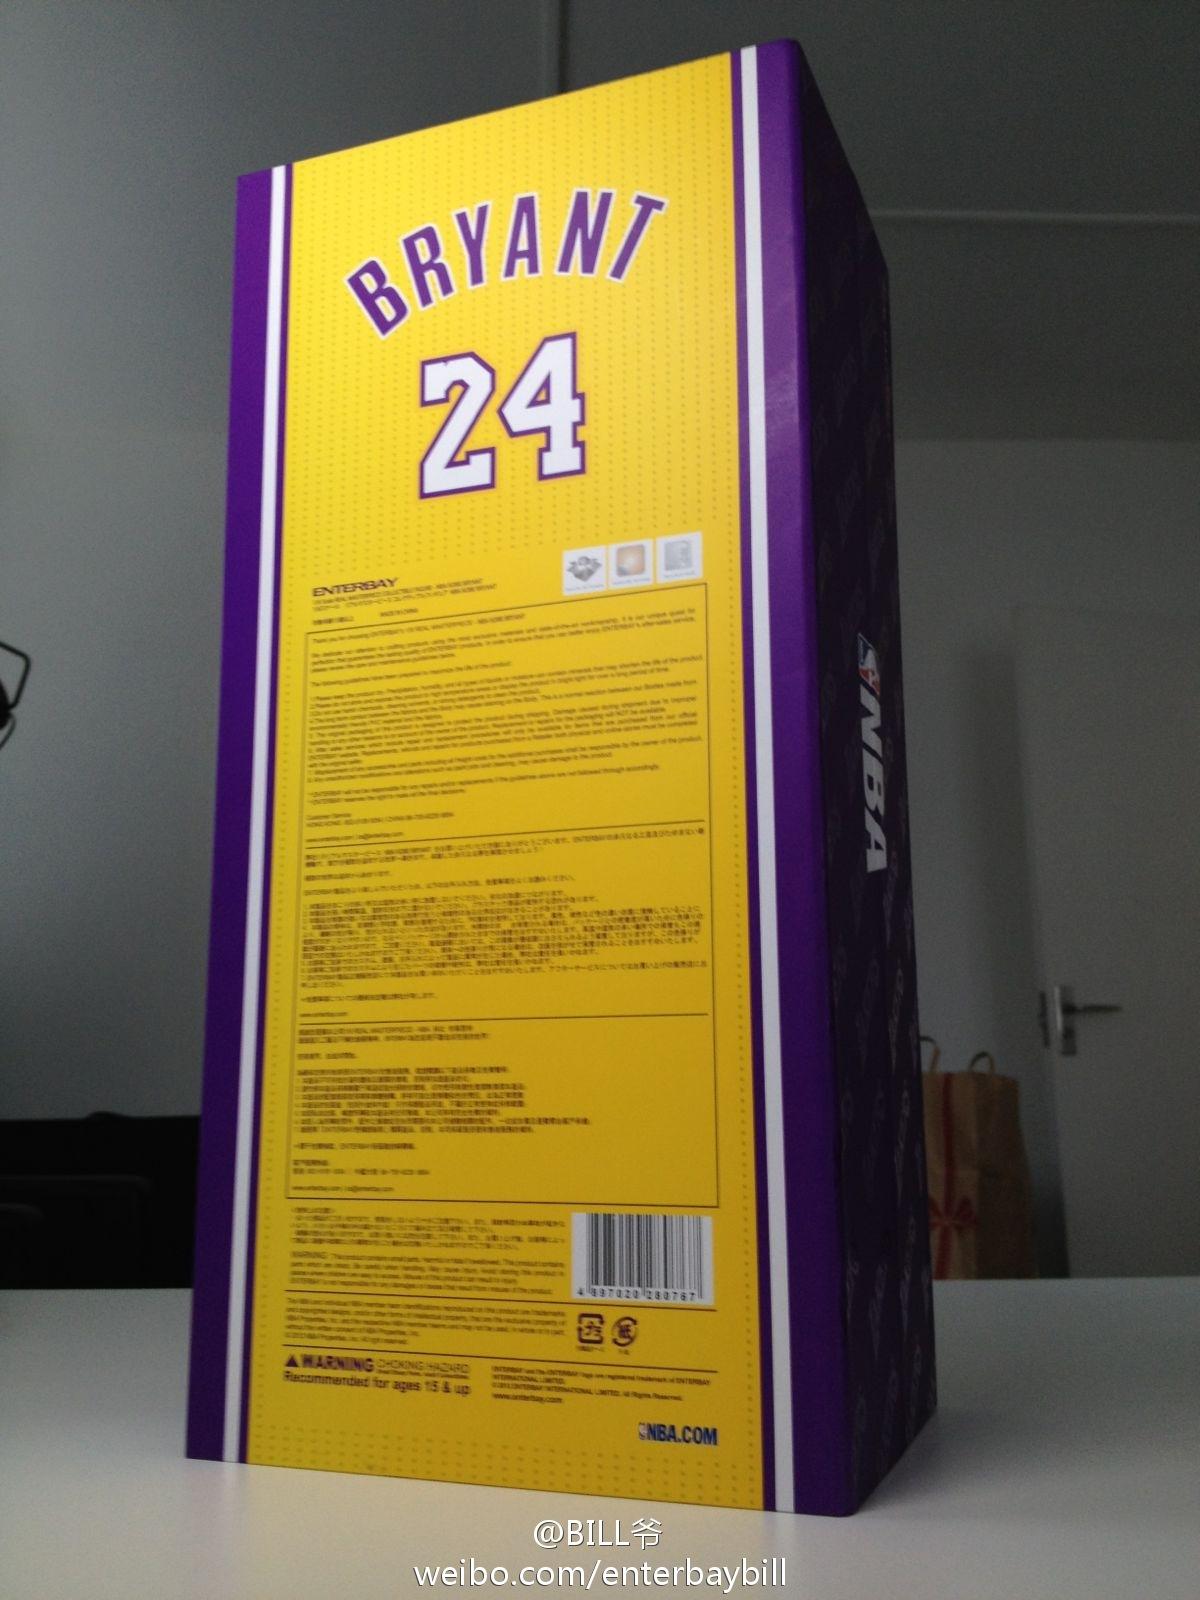 [ENTERBAY] NBA Real Masterpiece - Kobe Bryant!!! - Página 3 69464edejw1du701jzvwoj